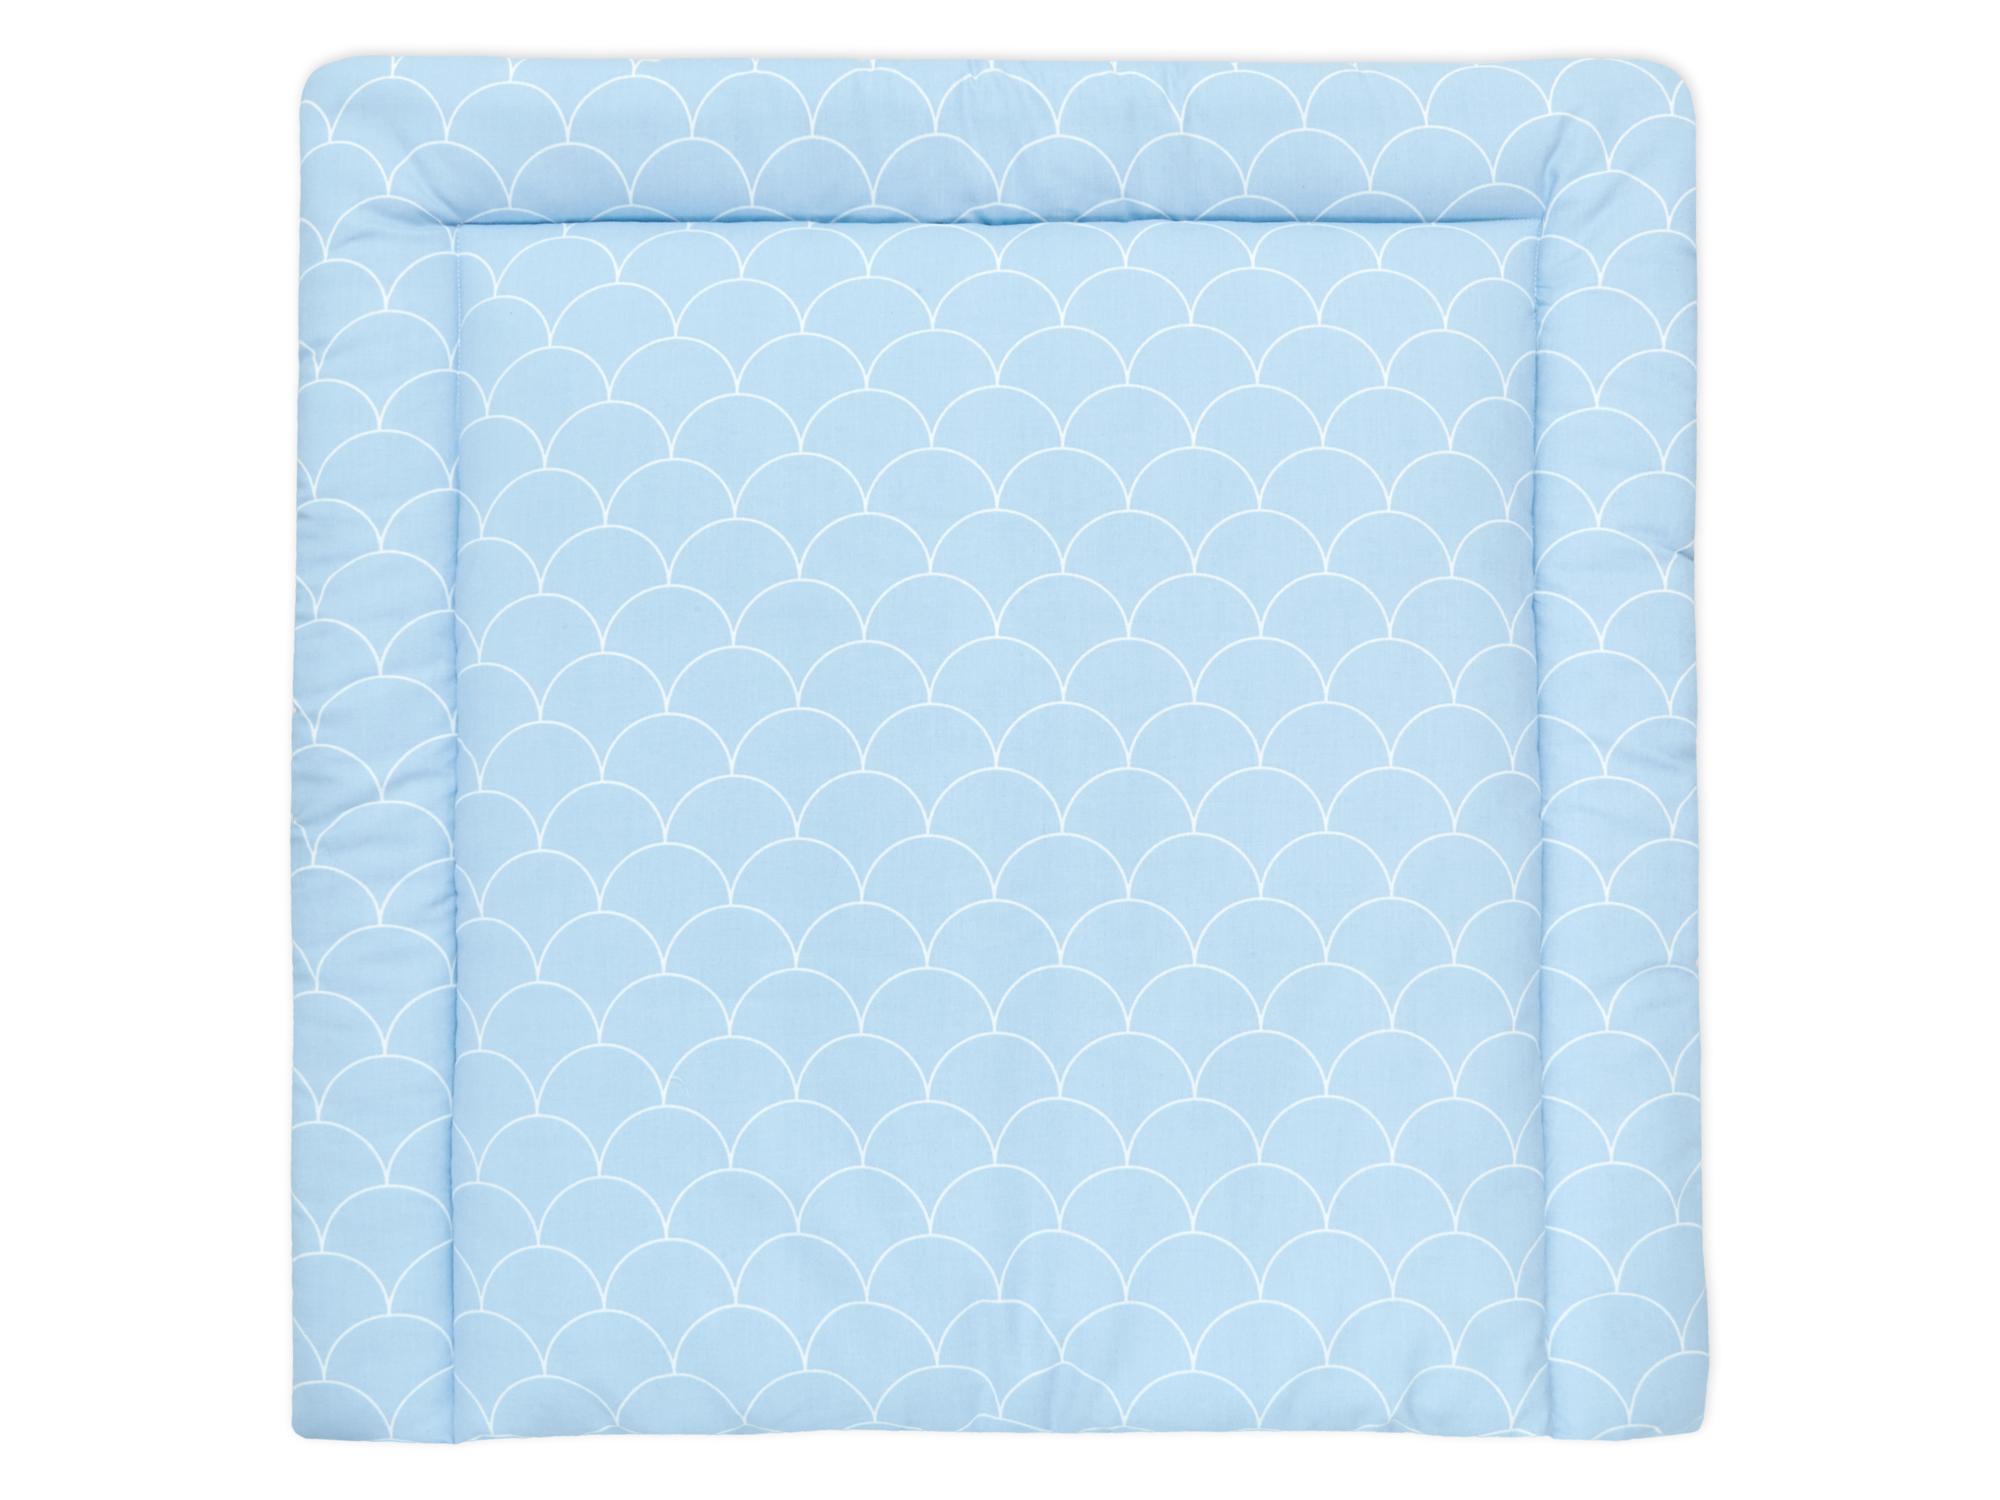 kraftkids wickelauflage wei e halbkreise auf pastelblau. Black Bedroom Furniture Sets. Home Design Ideas